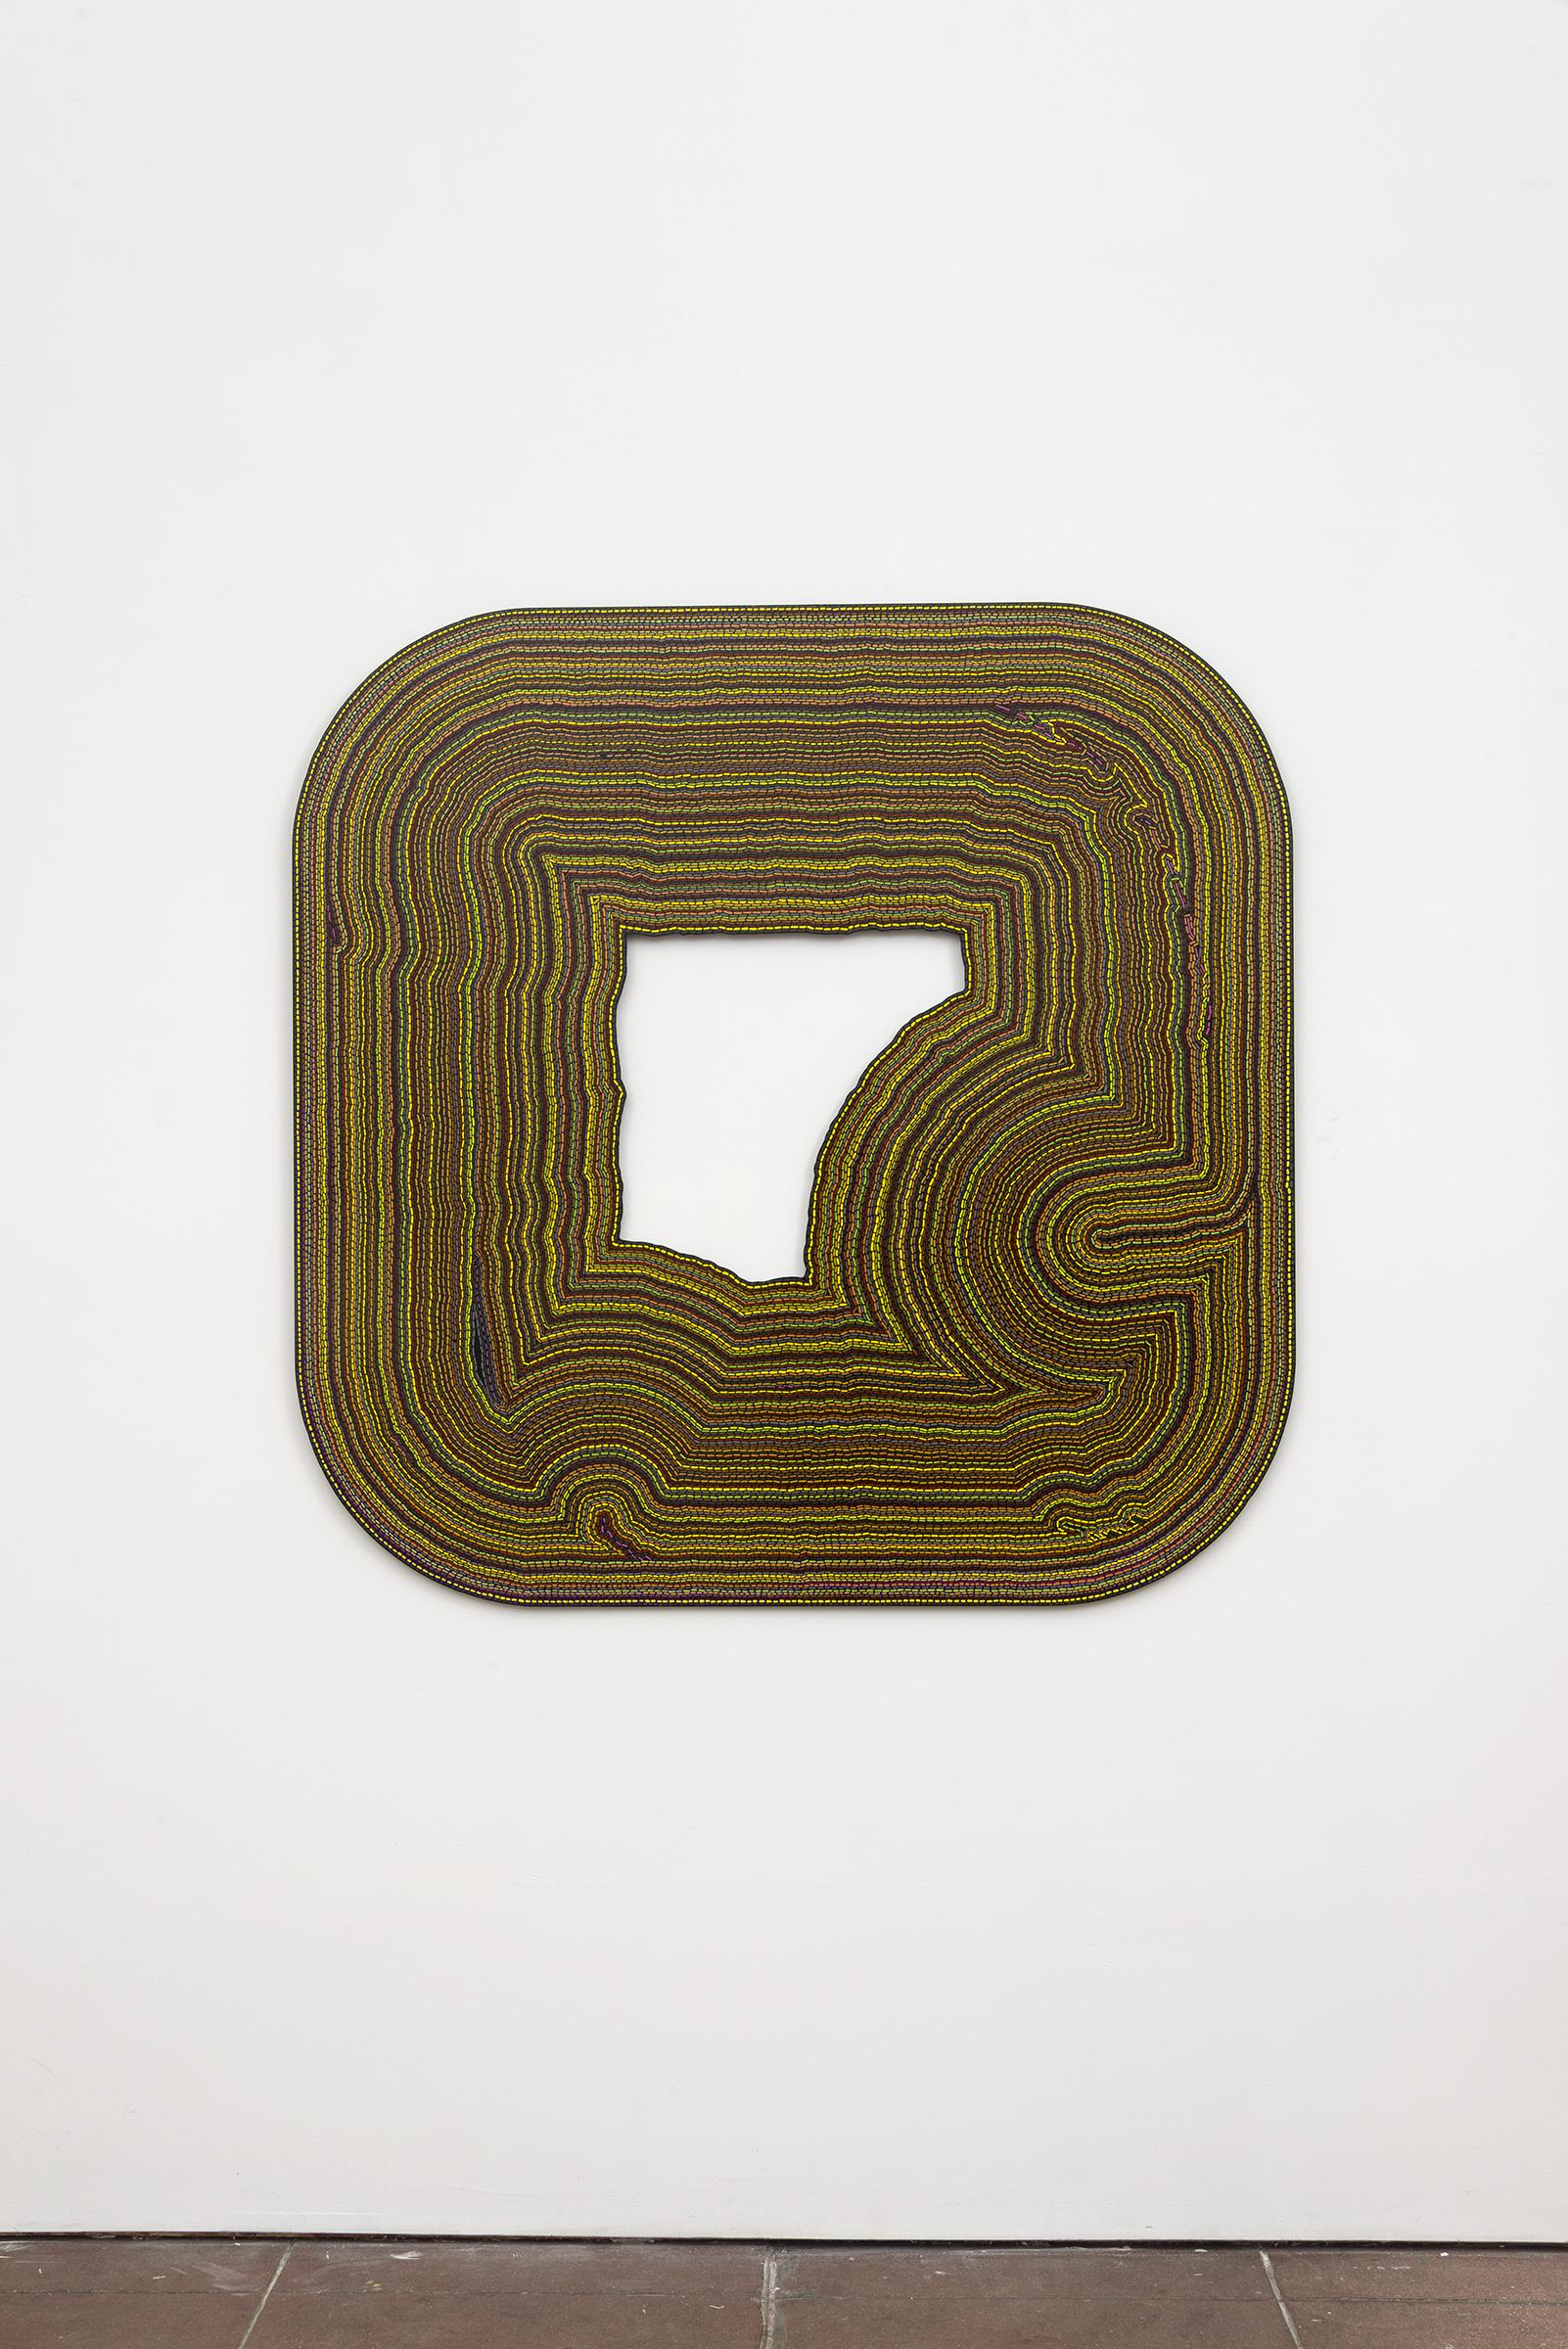 Roland Thompson, Tremble ,2003, acrylic on aluminum, 48 x 48 in